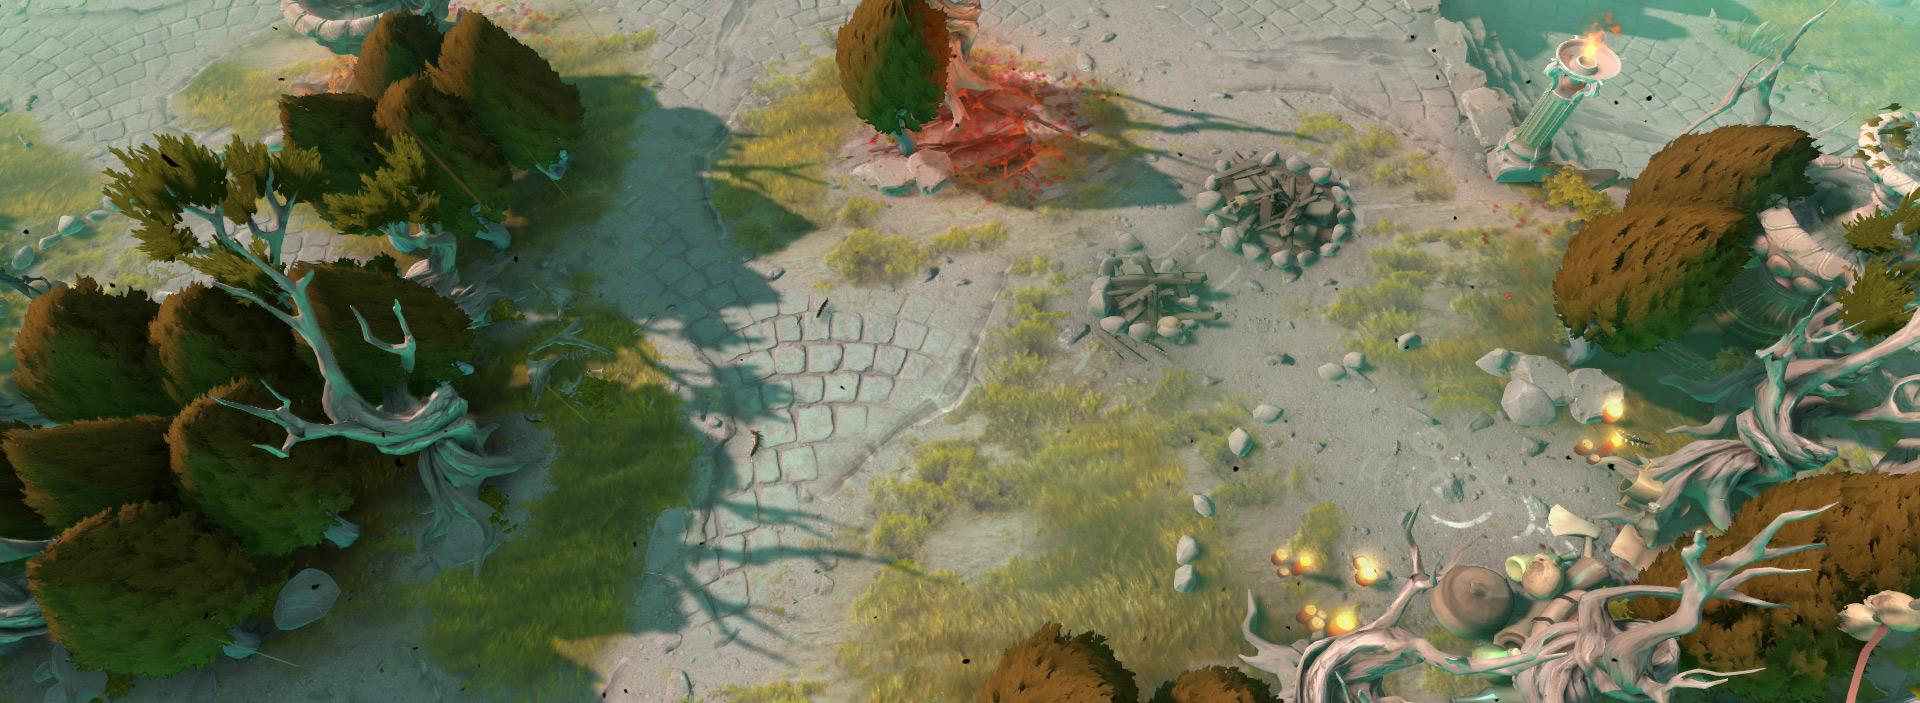 Immortal Gardens Weather Pestilence Preview 3.jpg